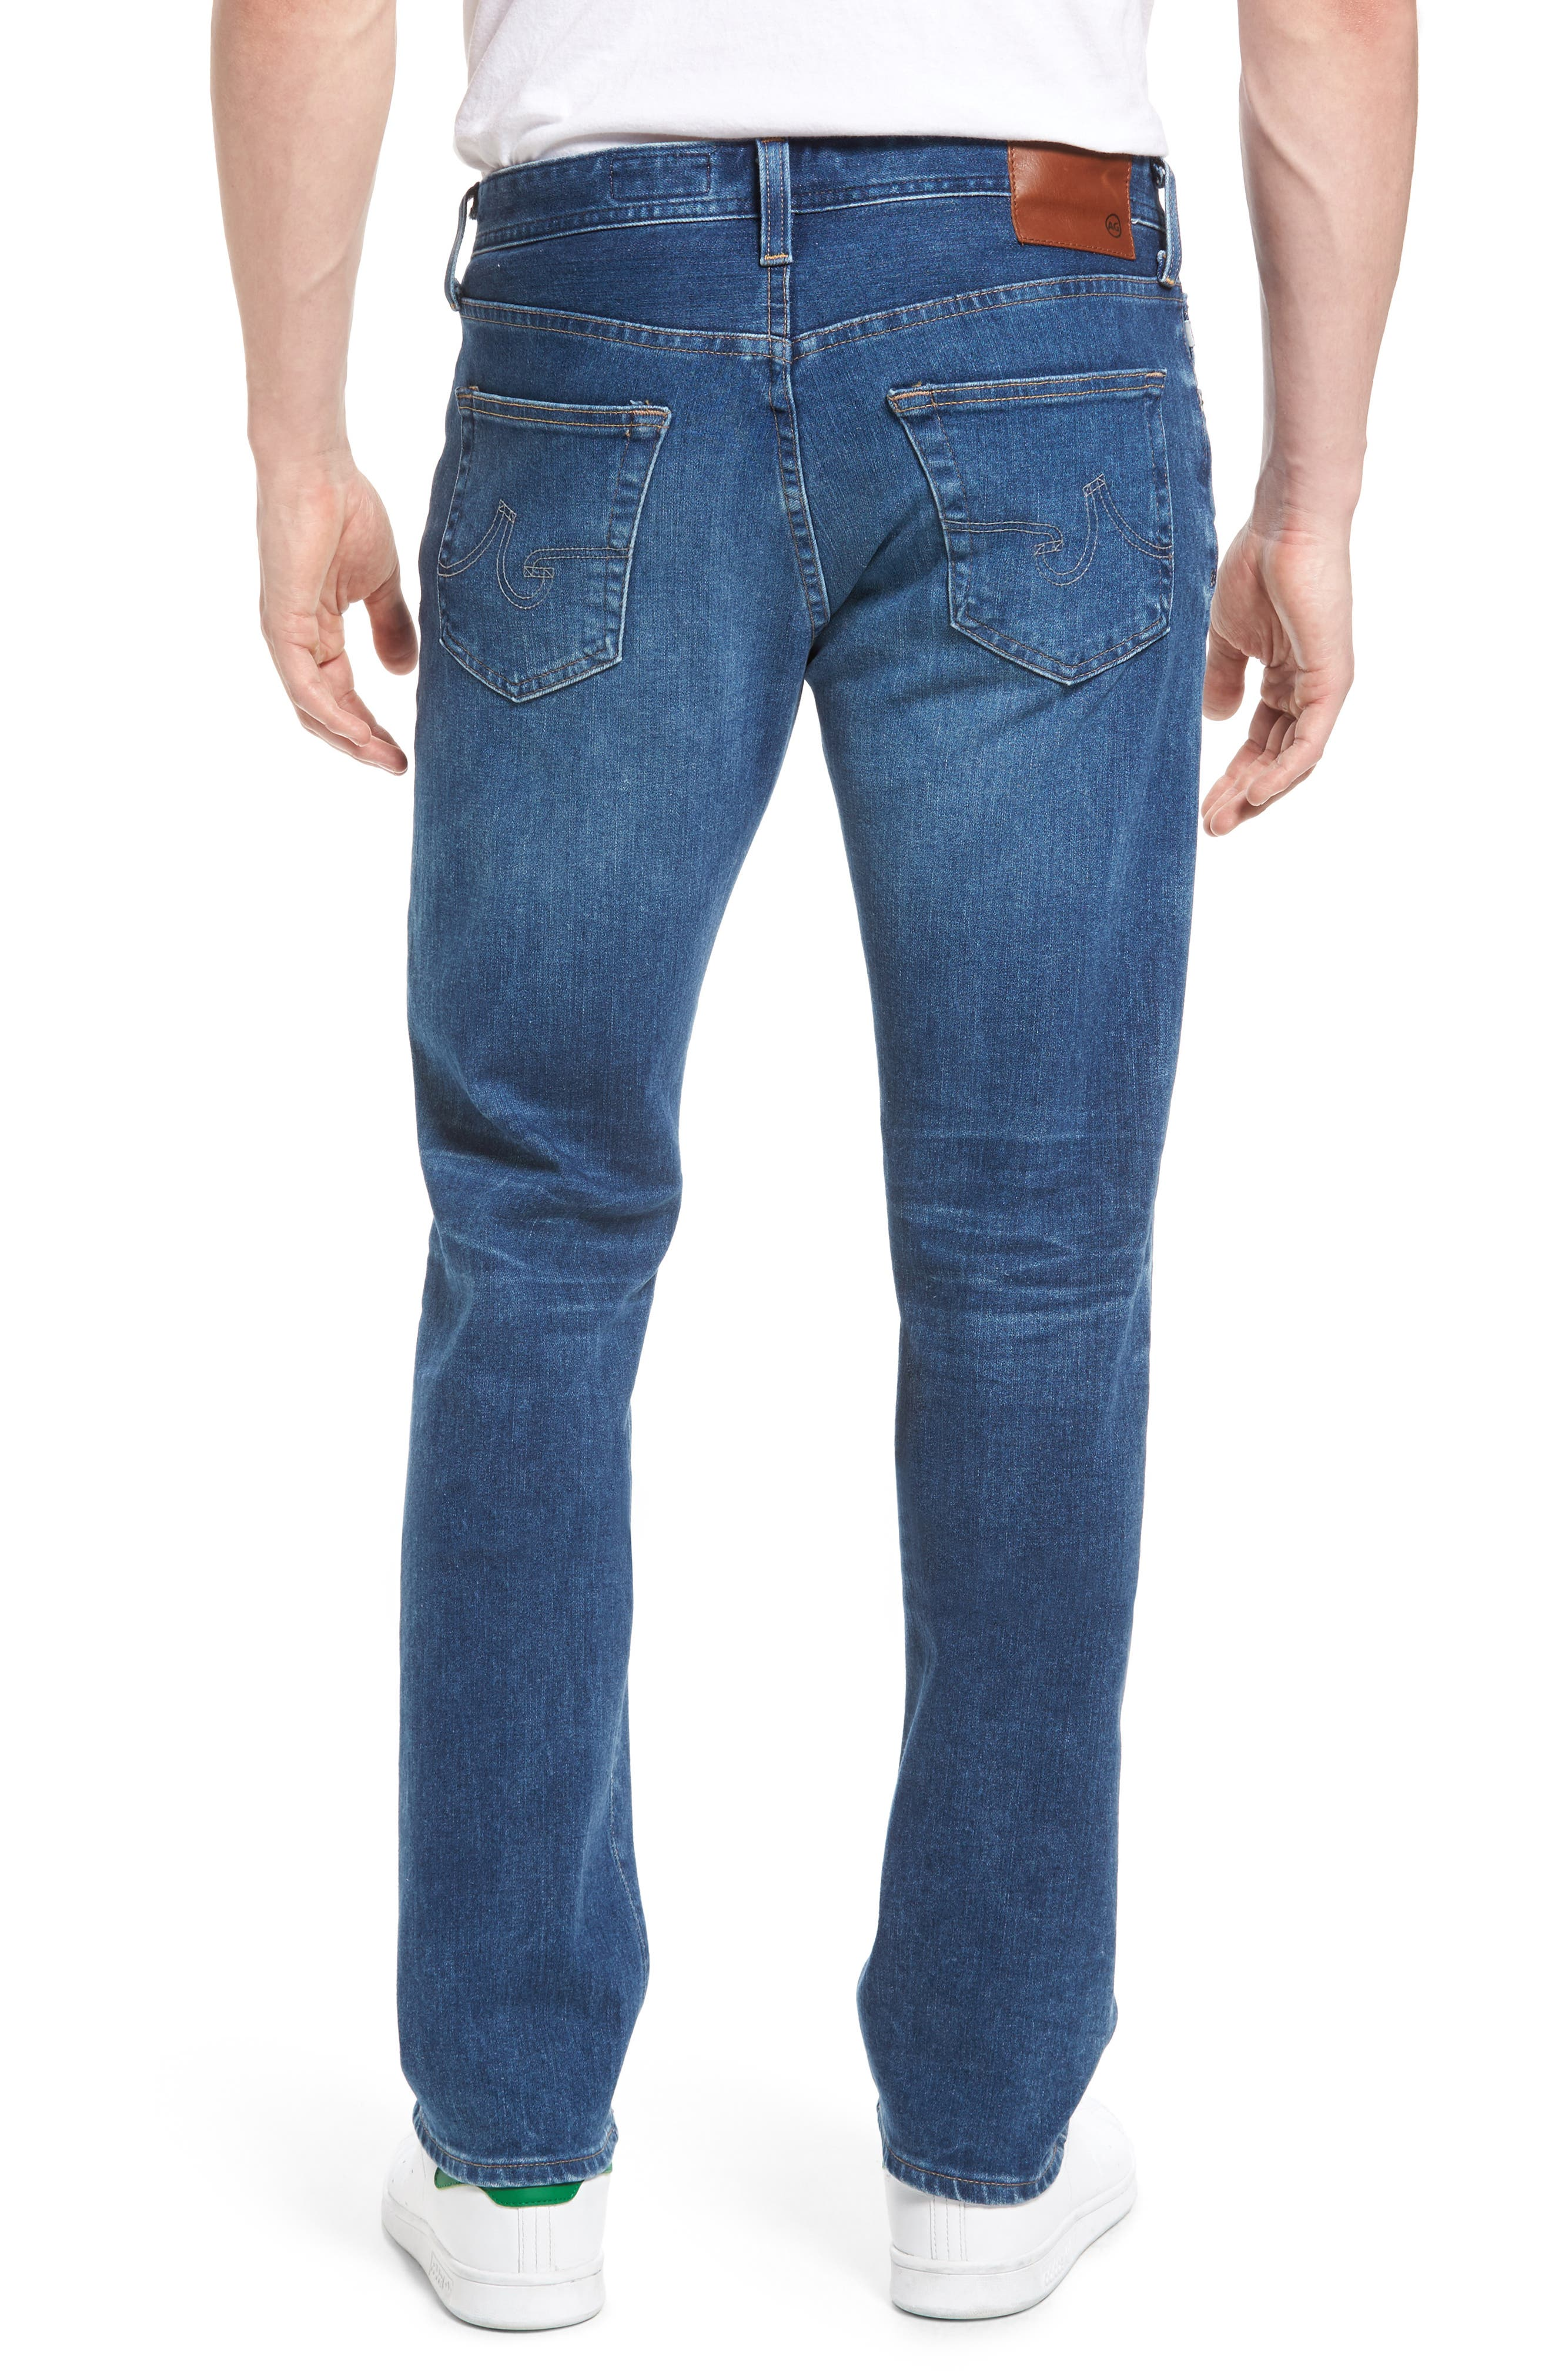 Graduate Slim Straight Leg Jeans,                             Alternate thumbnail 2, color,                             450